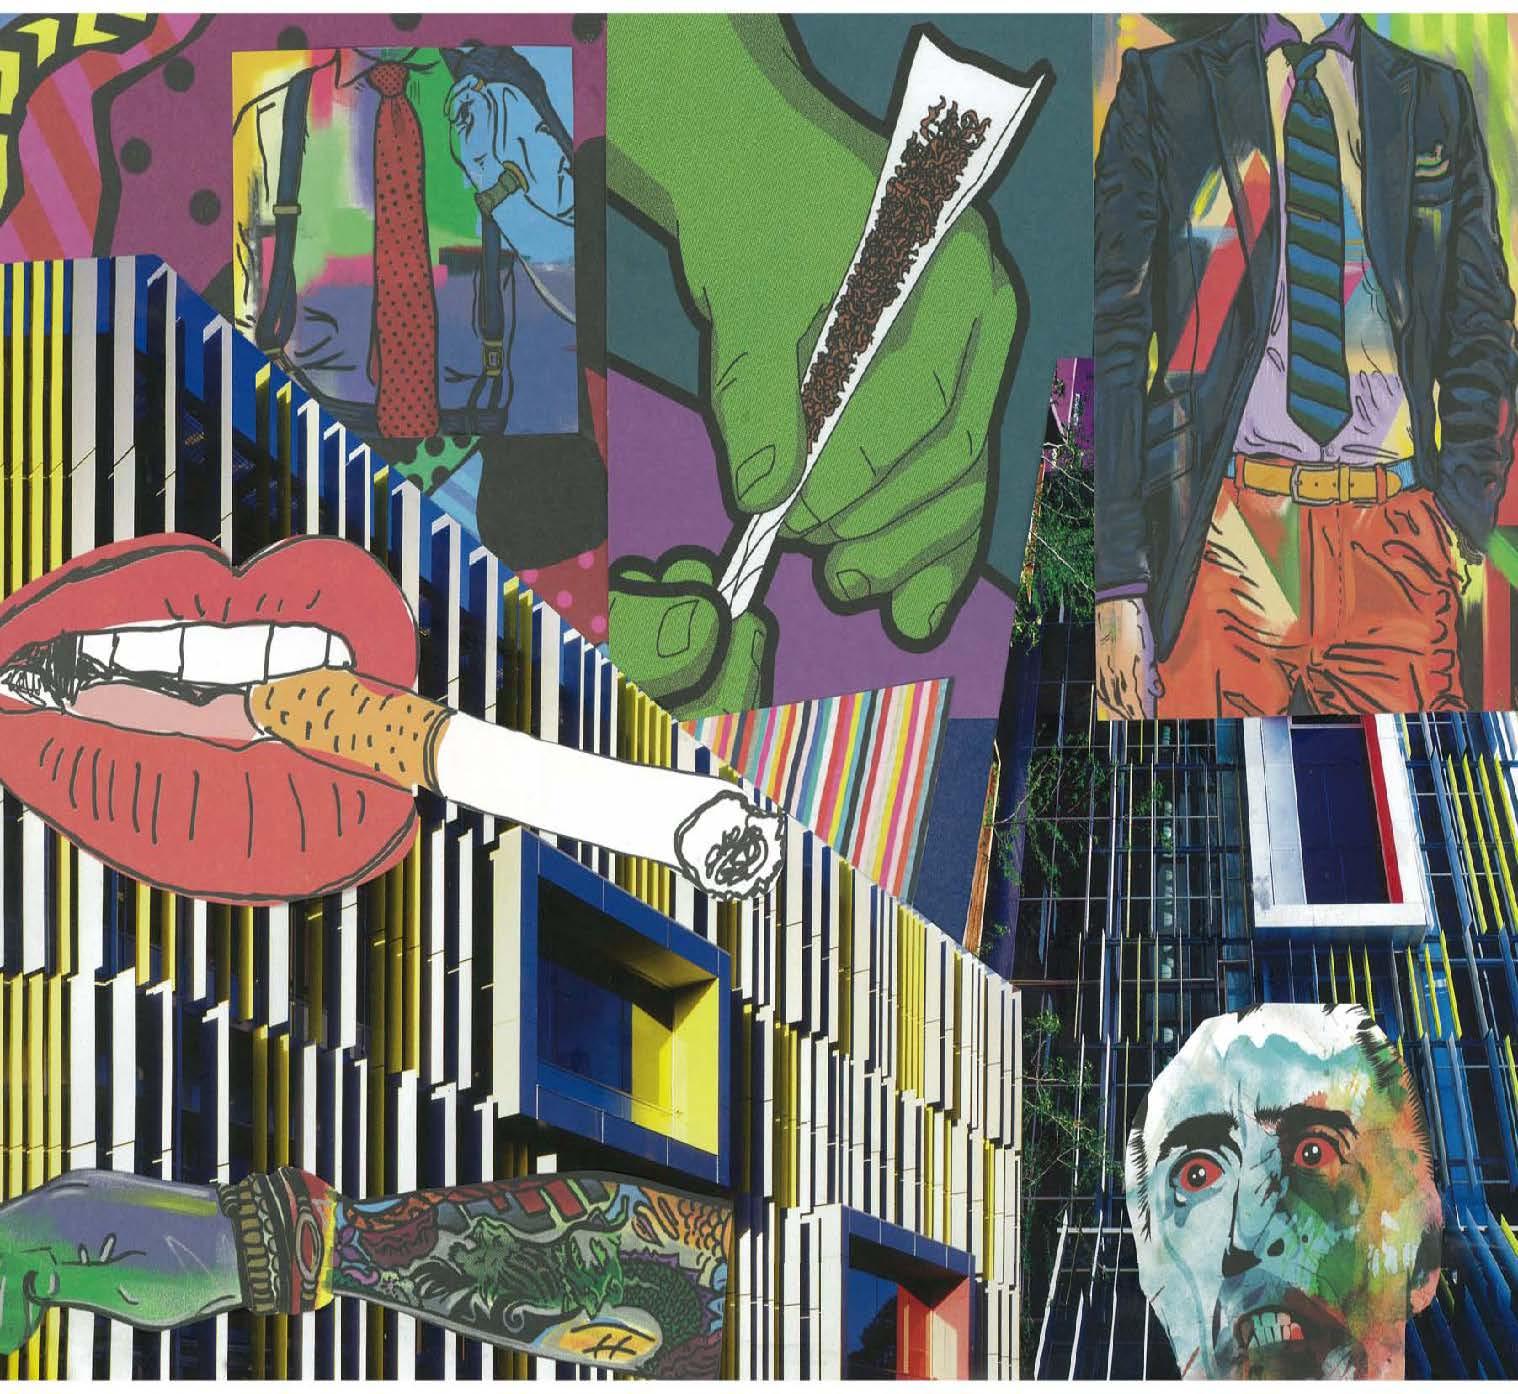 Artwork By GWK - The Grind